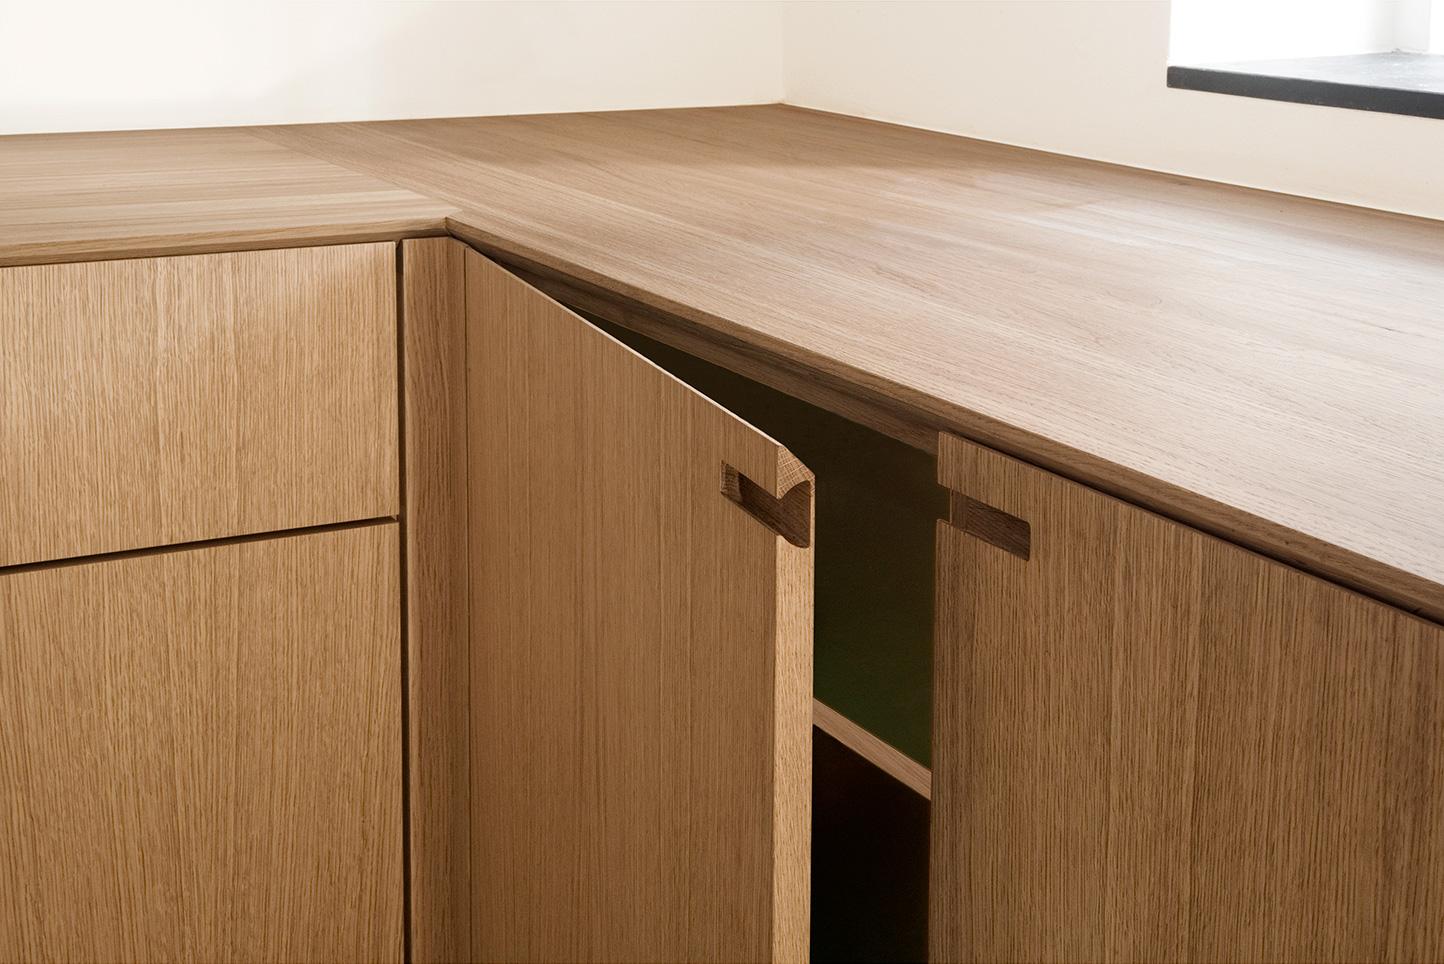 Snedkerkøkken I egetræ og grøn laminat. Designet og produceret Nicolaj Bo™